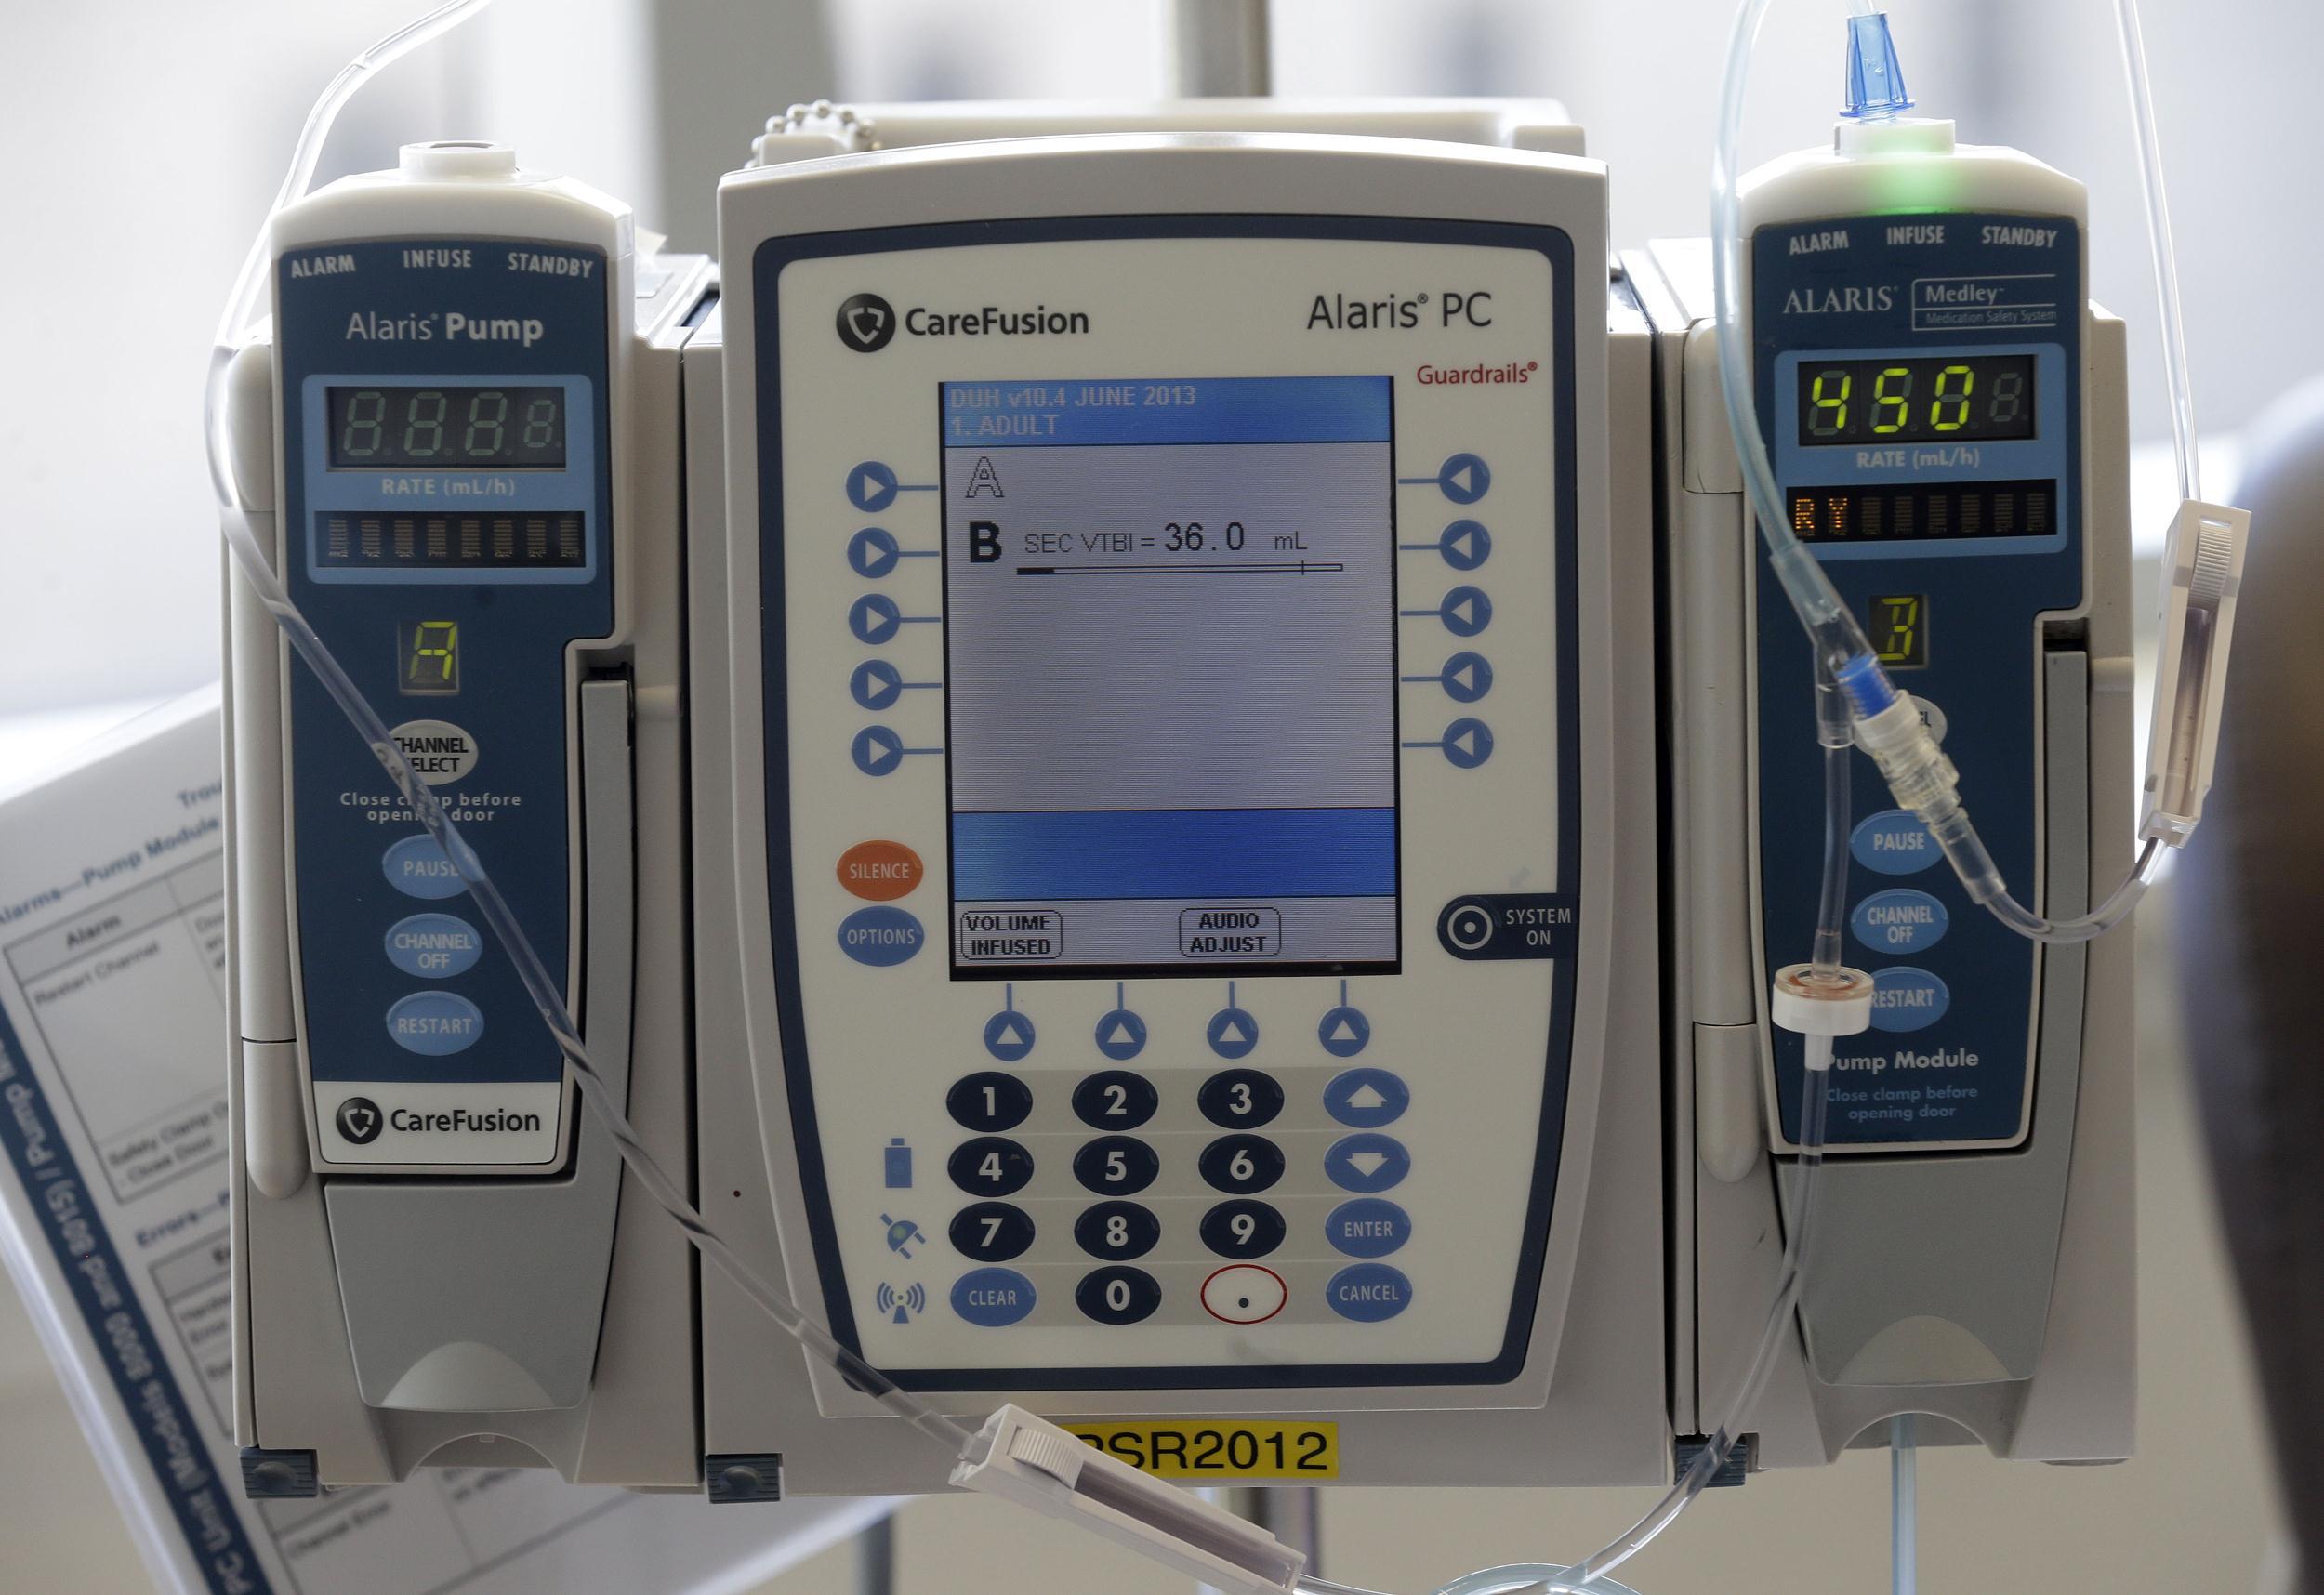 140601-chemotherapy-jsw-1034a_d68711d64905994b1c5d795a6fa91f76